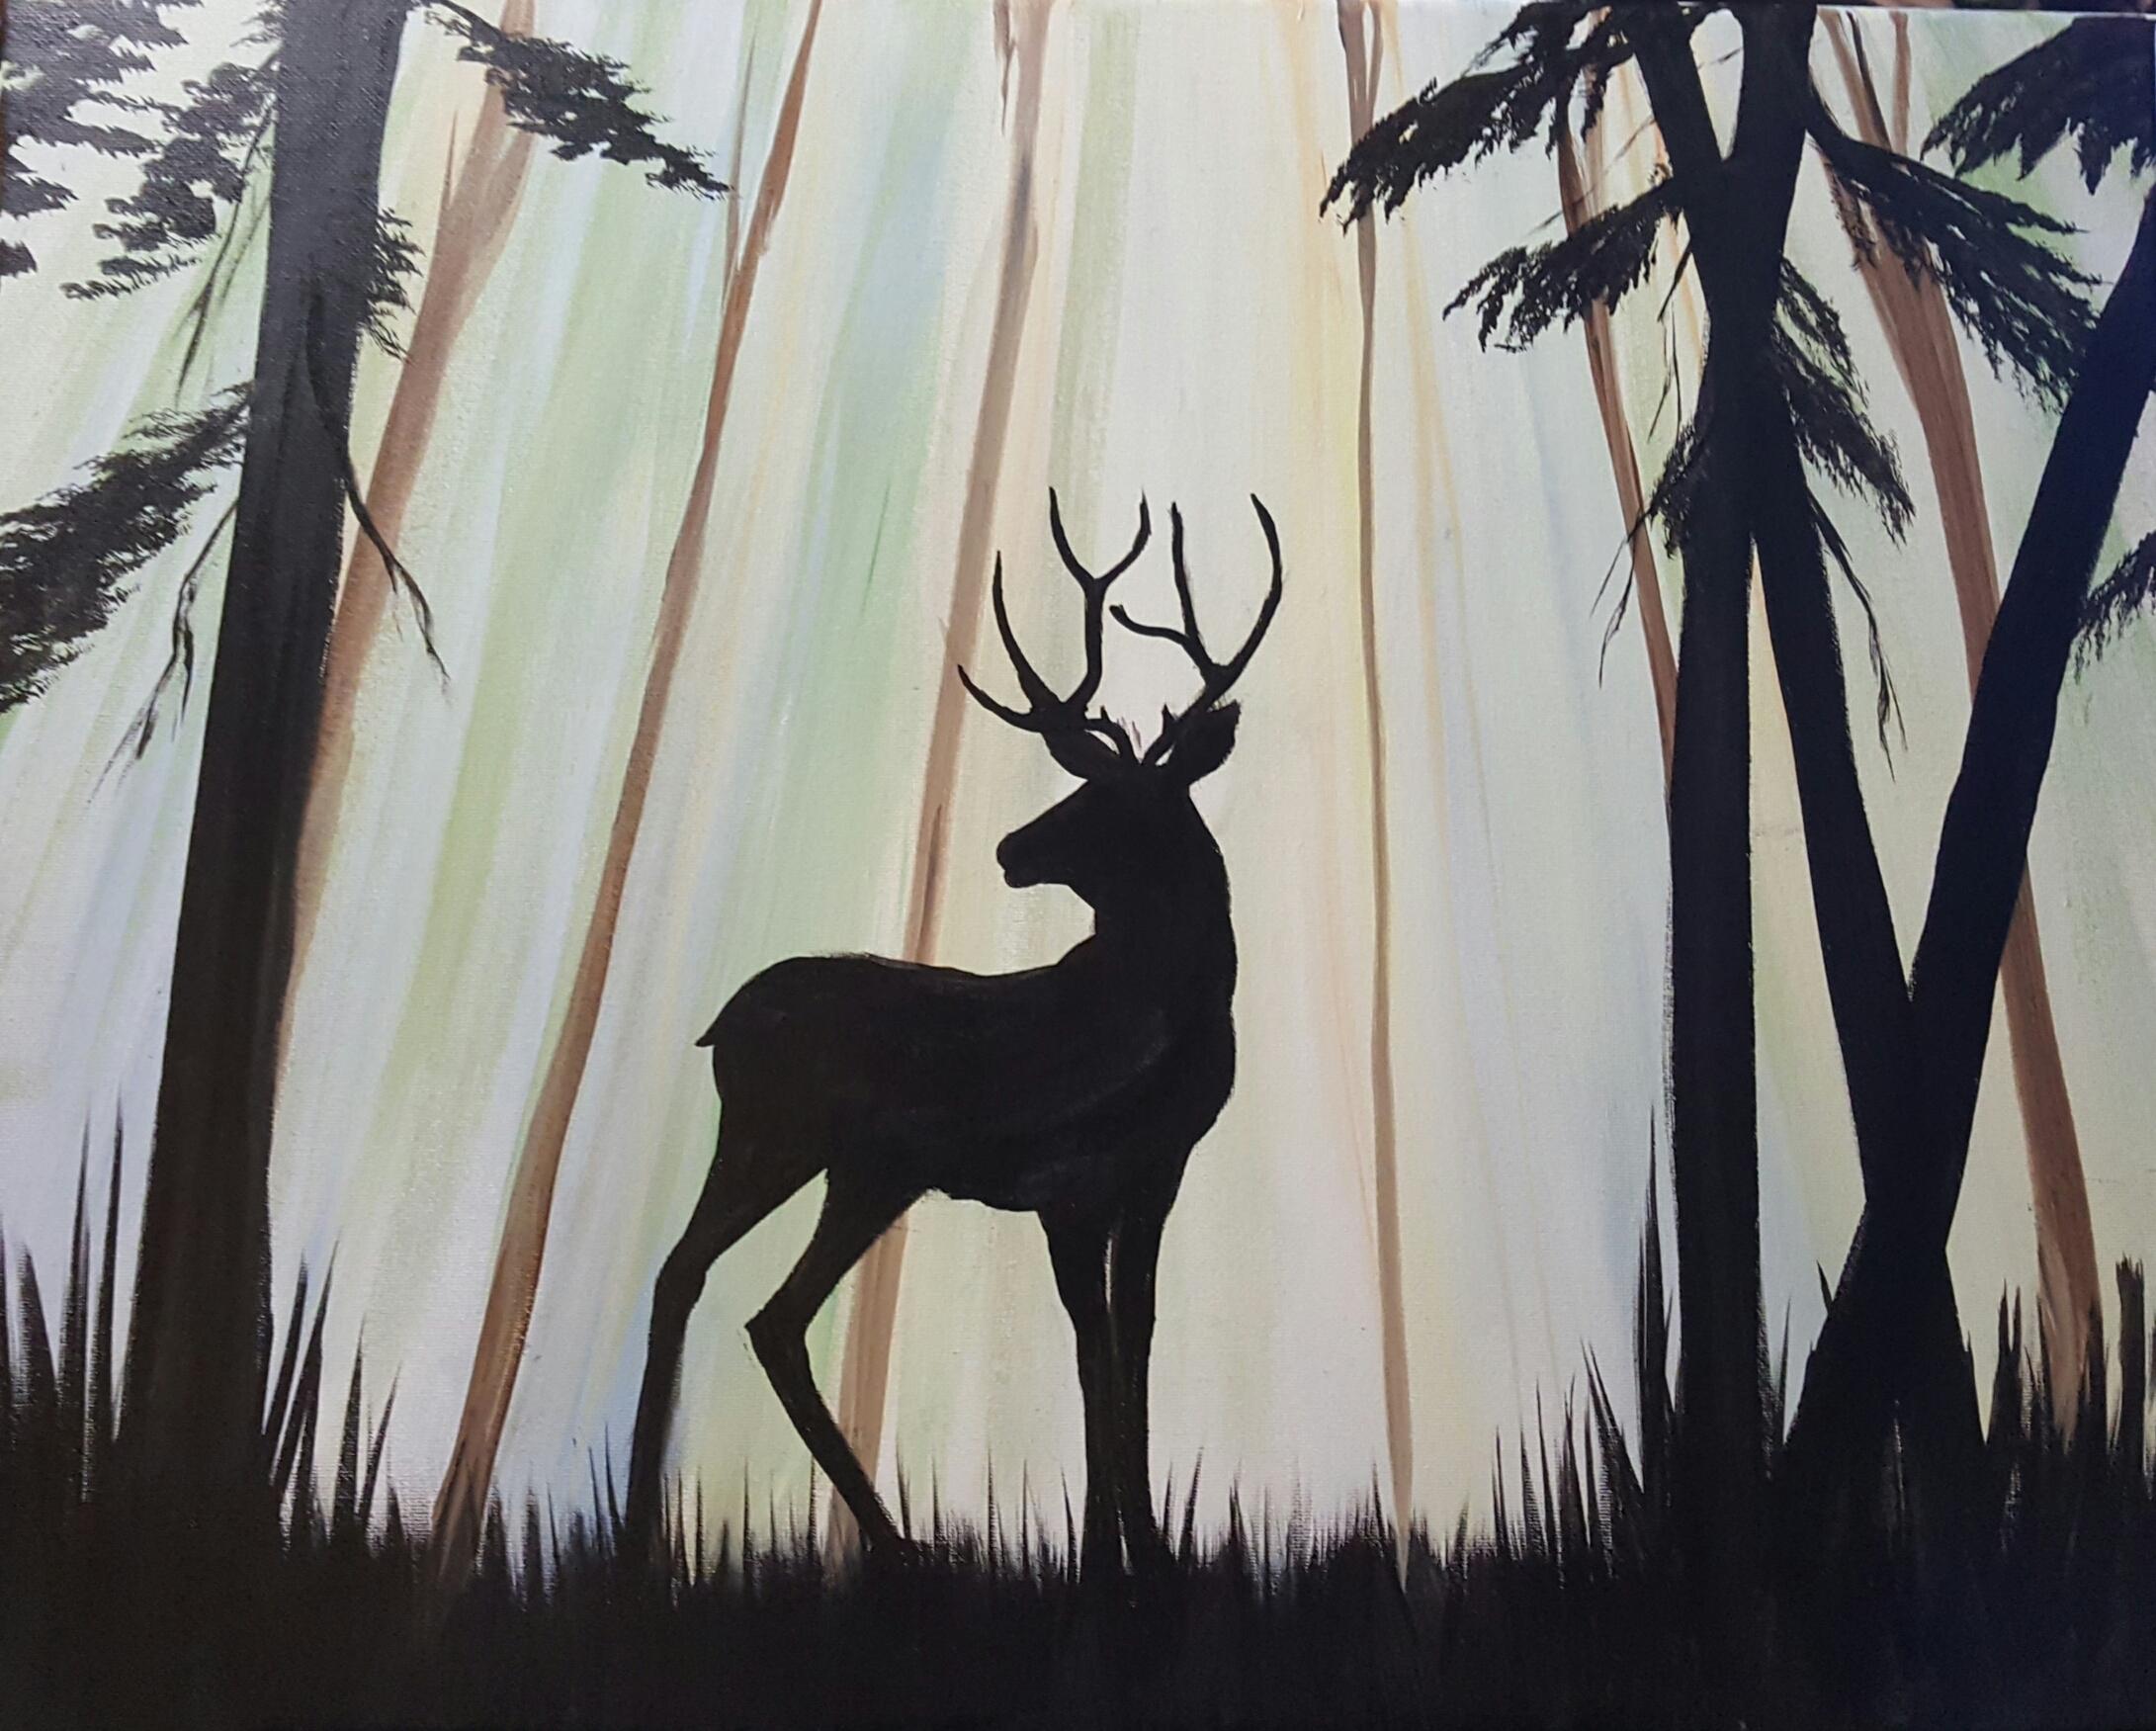 Peeking Through the Forrest